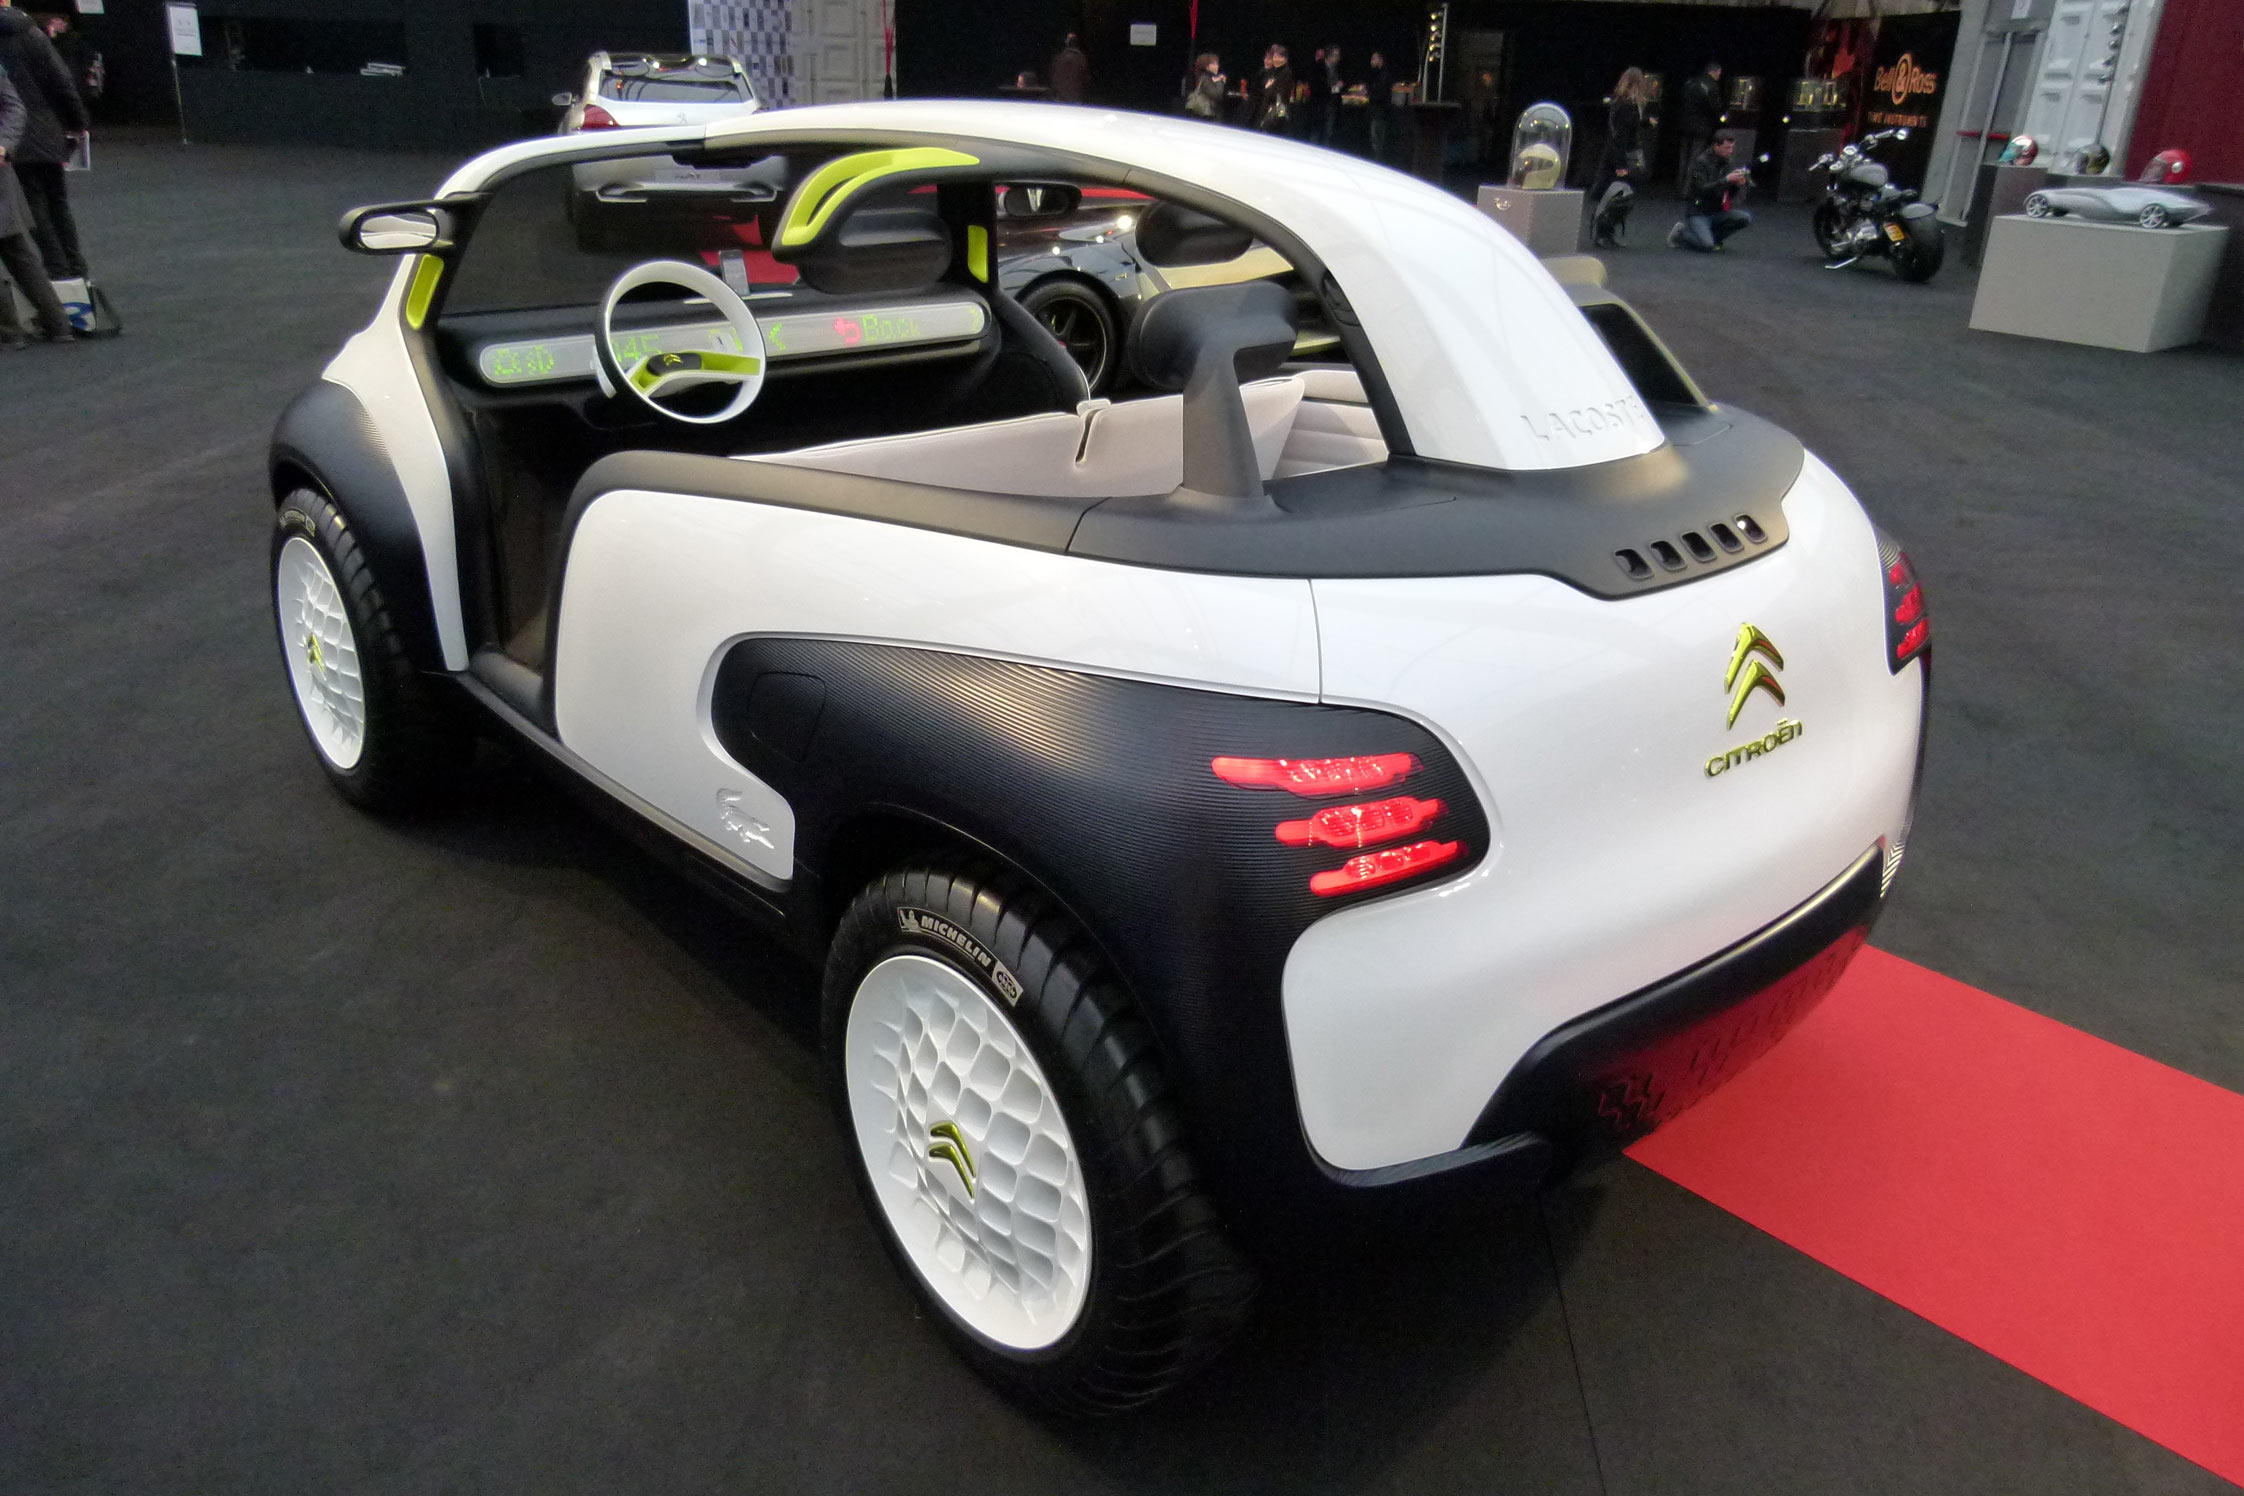 photo citroen lacoste concept concept car 2010 m diatheque. Black Bedroom Furniture Sets. Home Design Ideas